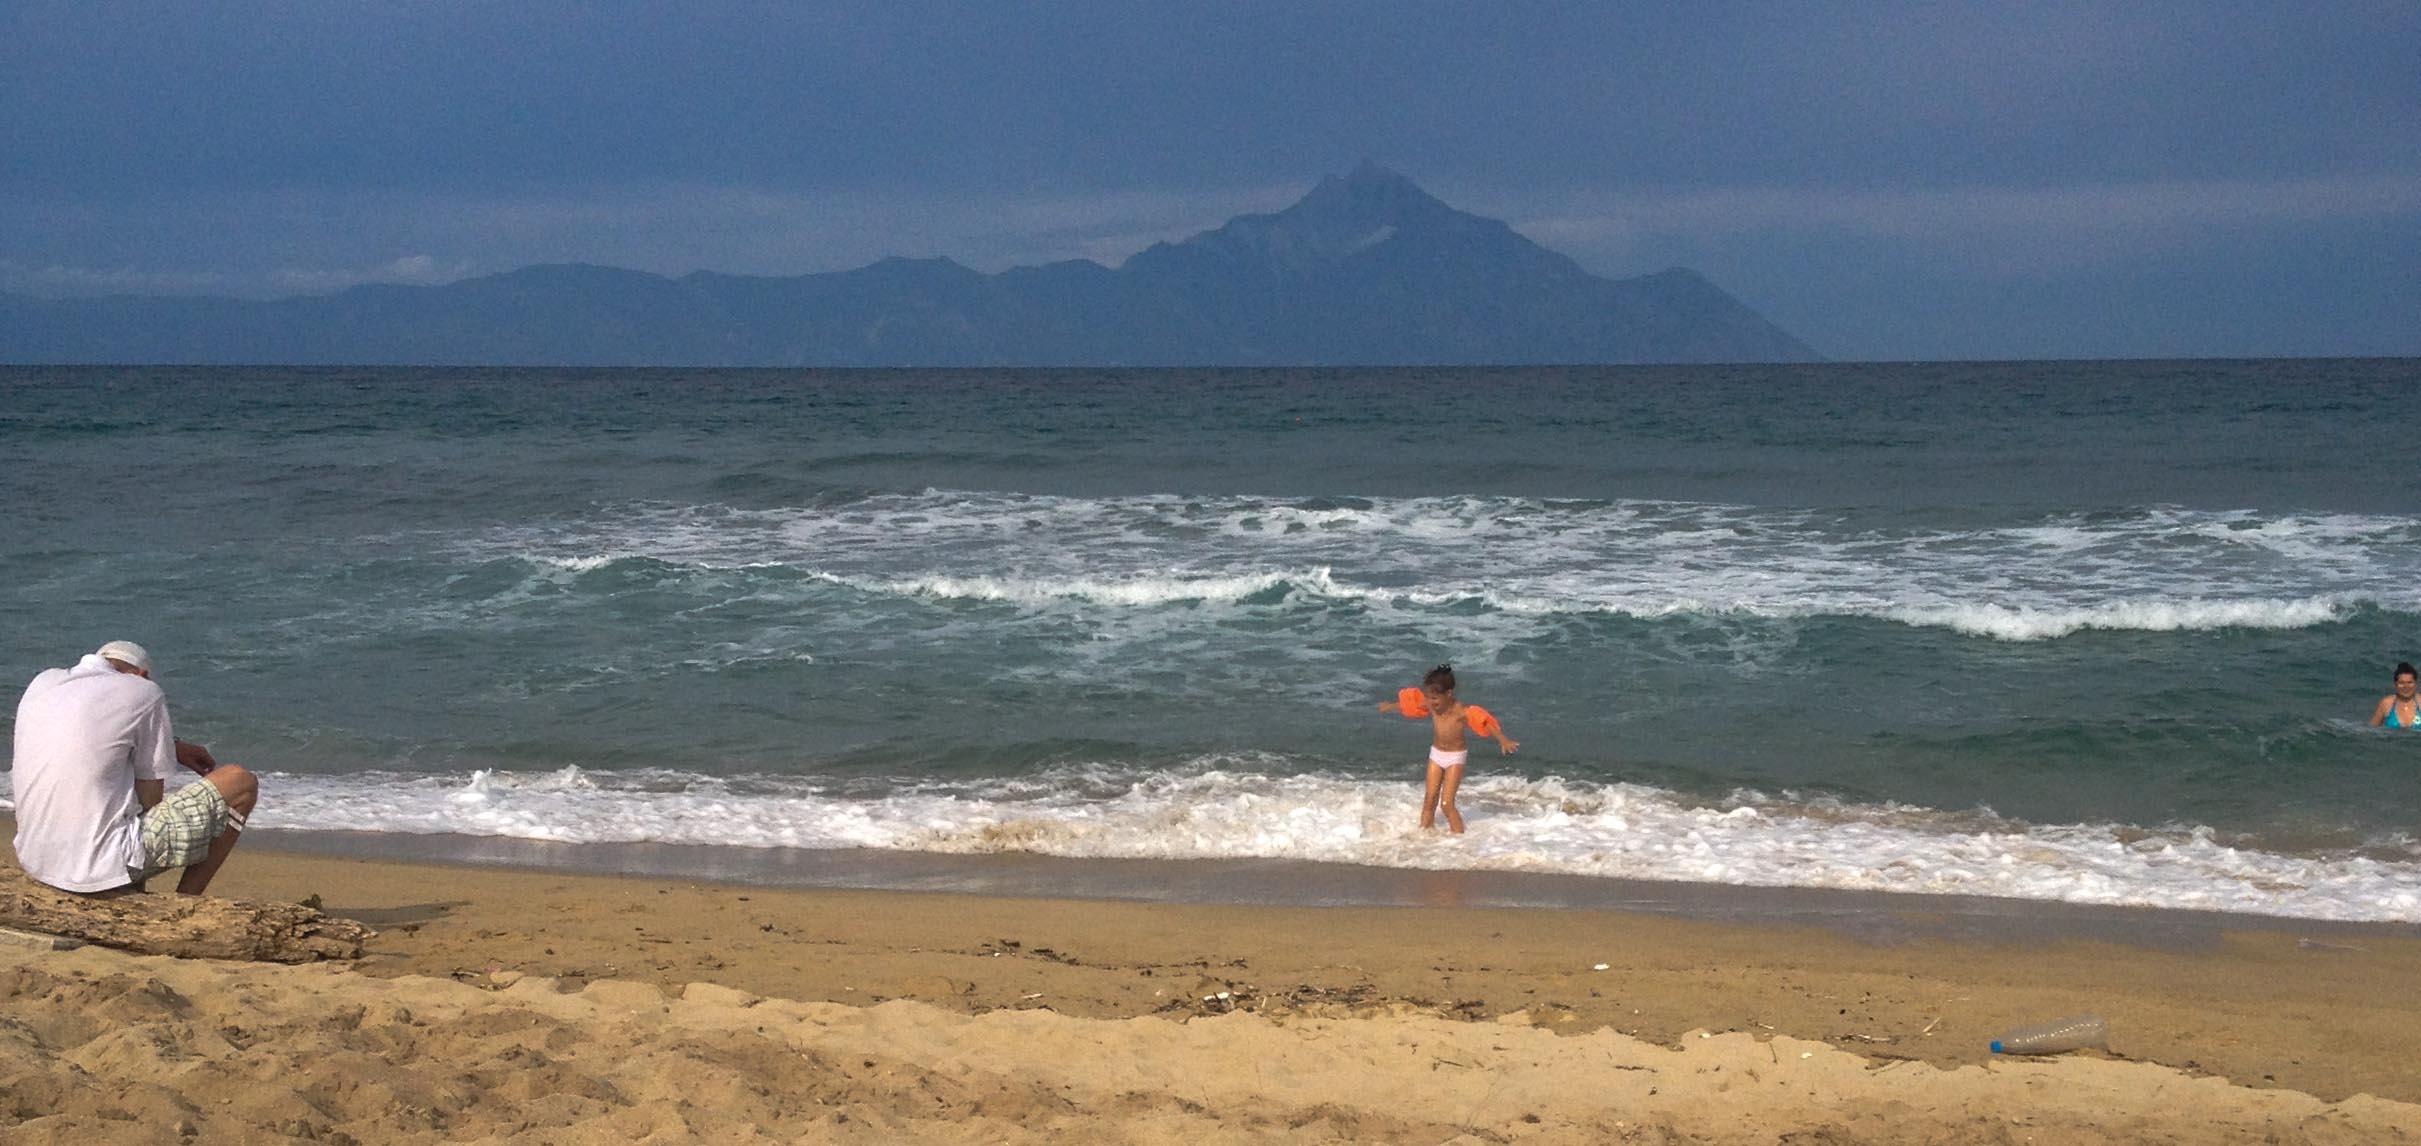 A beach in Sarti. (Photo by Maya Kroth)